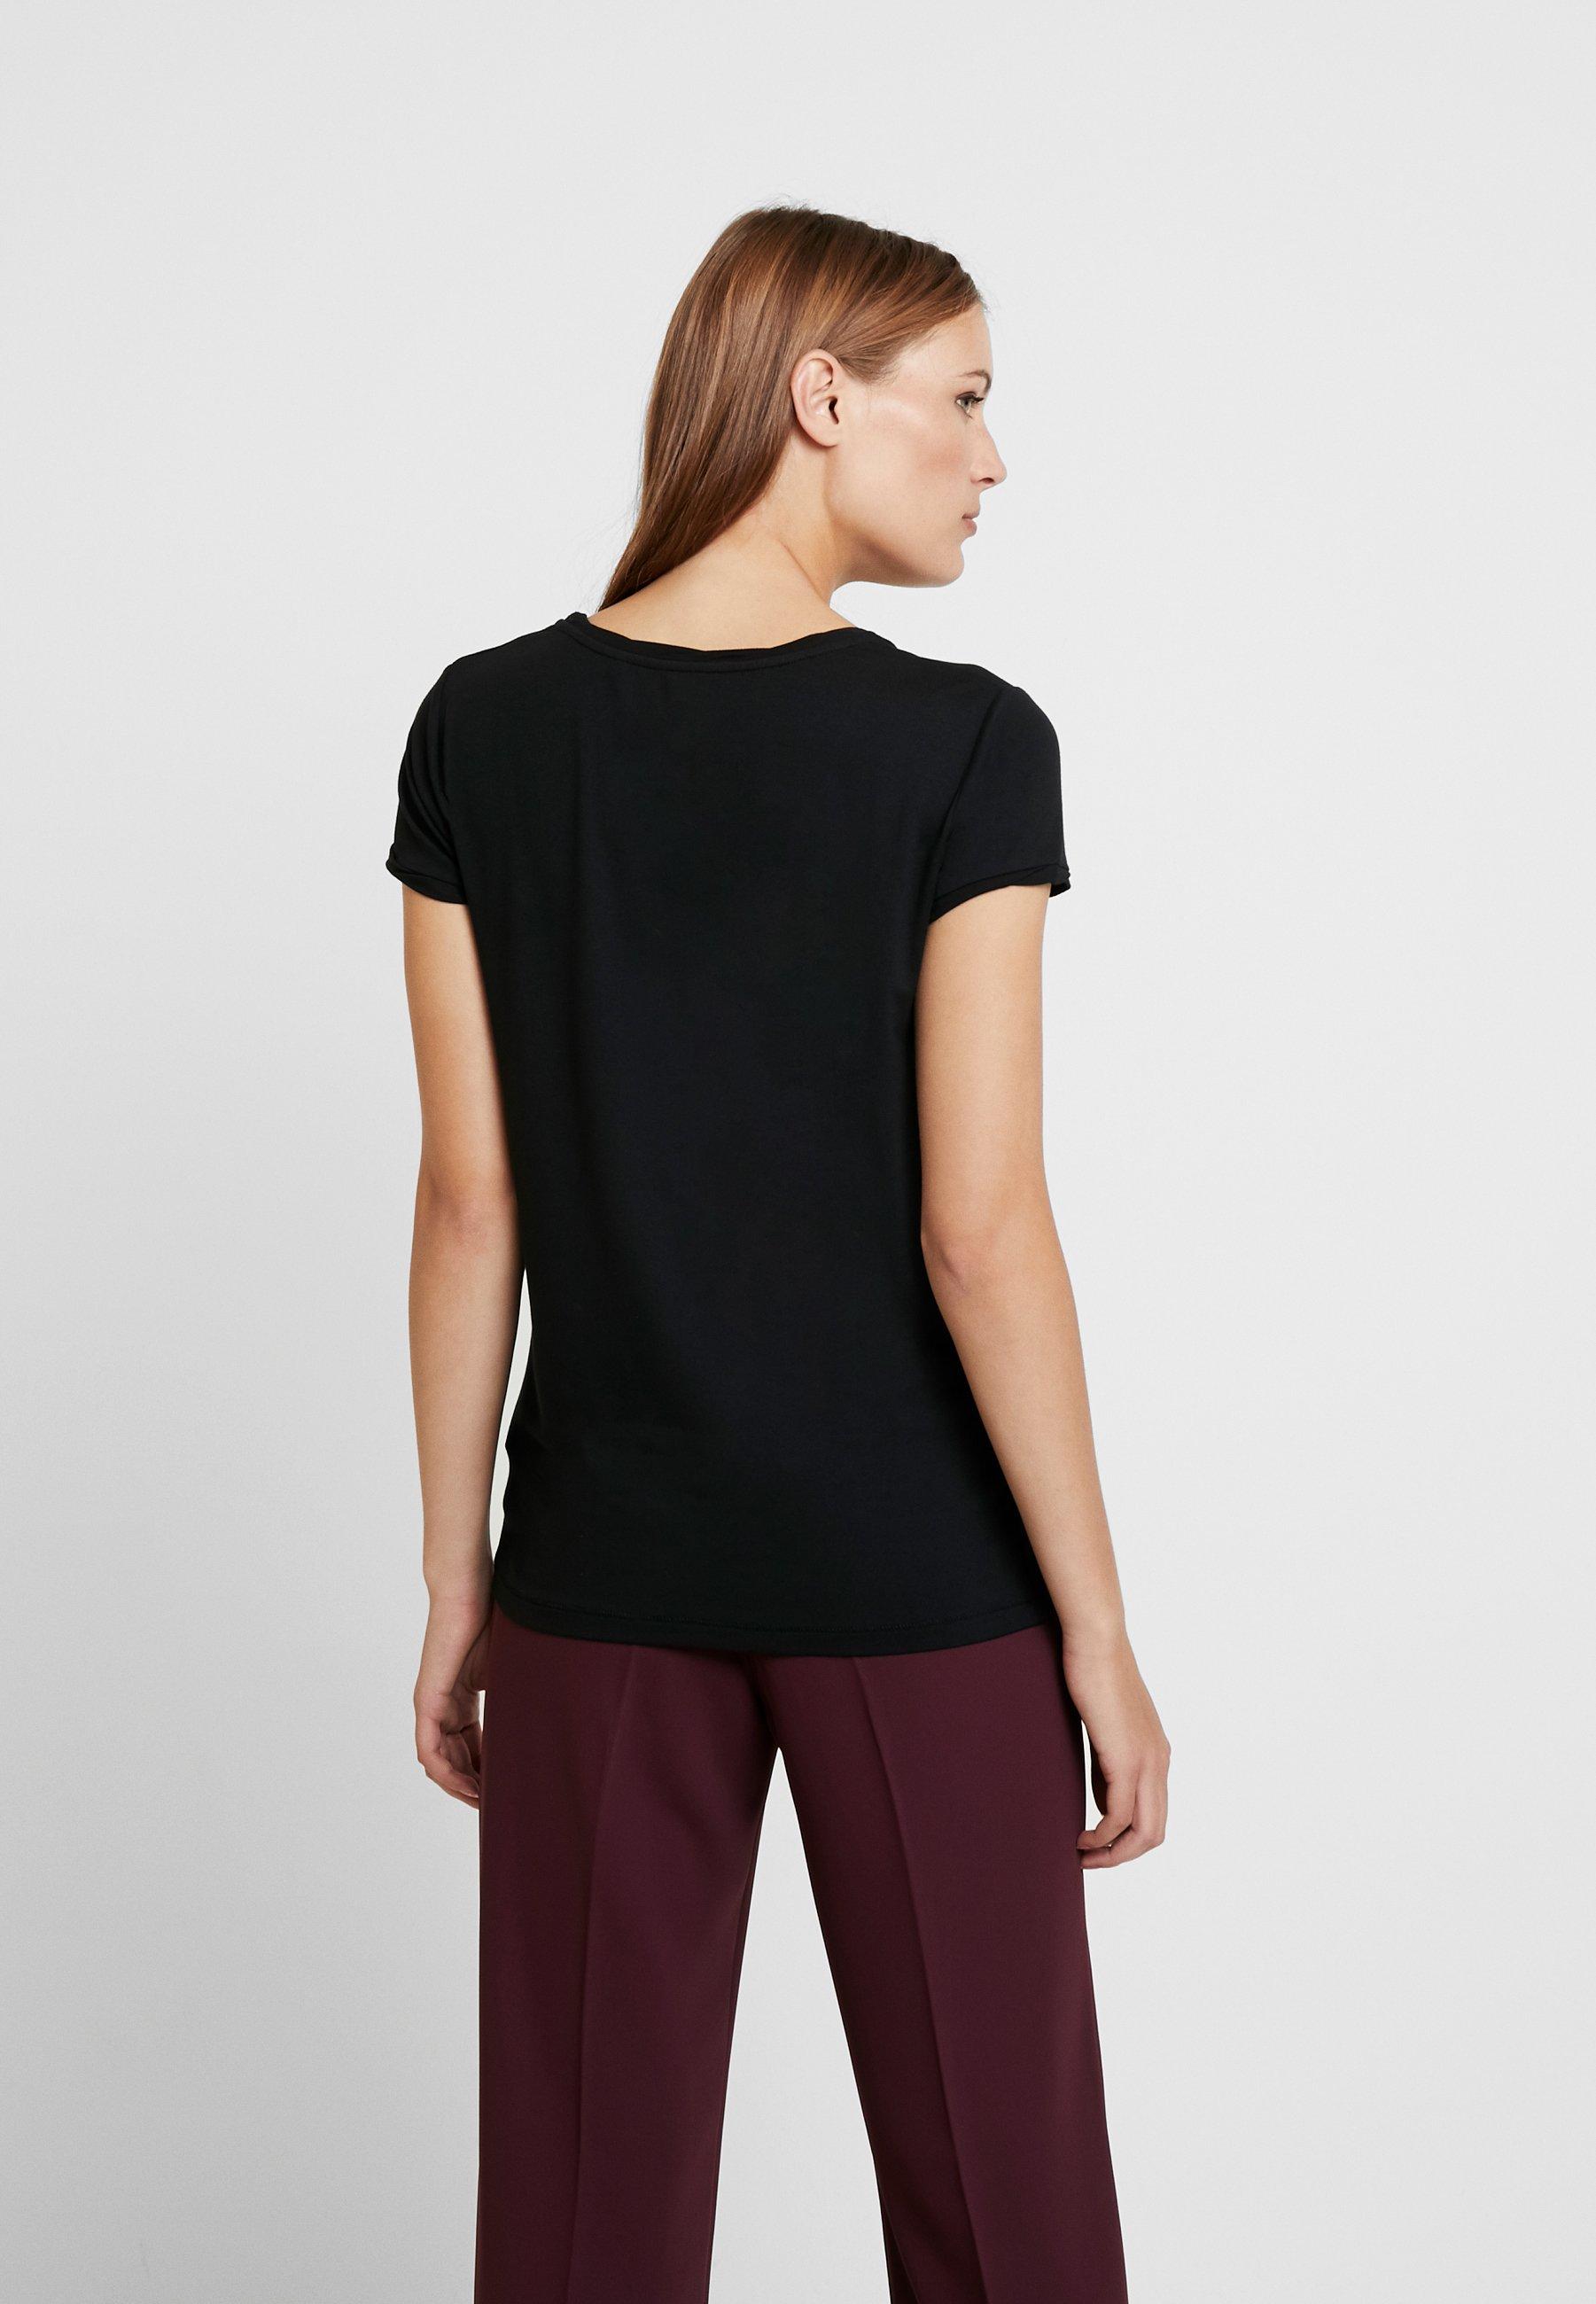 Day Birger Et Mikkelsen New Clean Twist - T-shirts Black